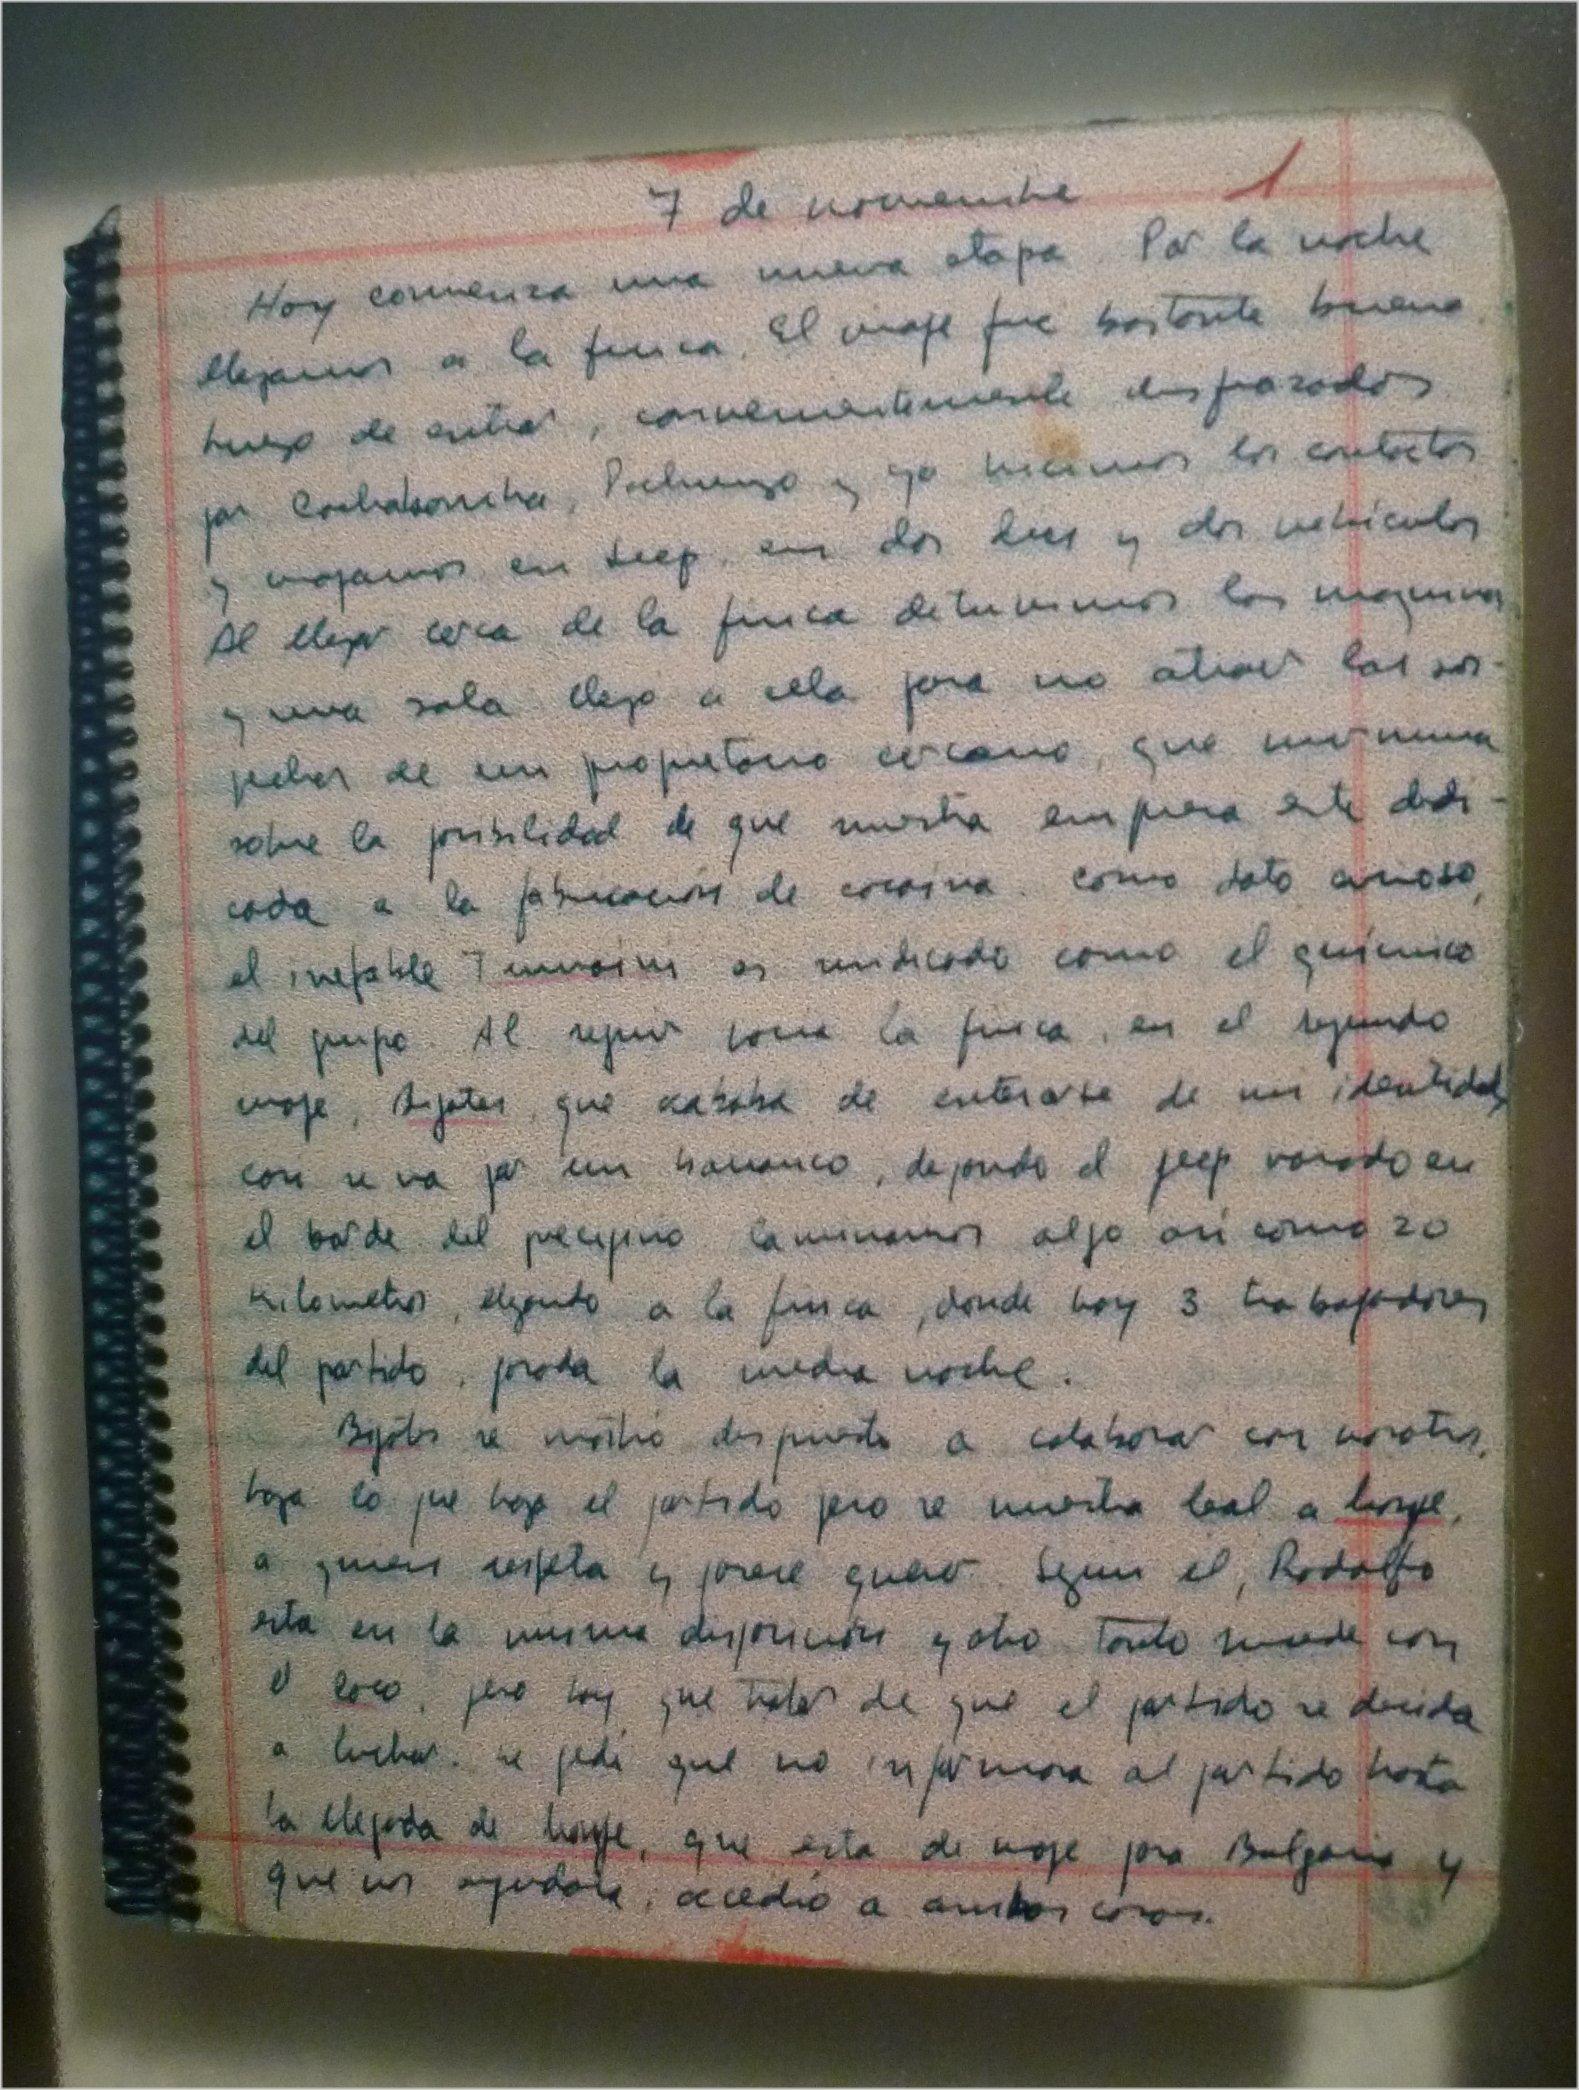 Diario del Che en Bolivia. Anotación de 7 de noviembre de 1966. (Museo Casa del Che Guevara, Alta Gracia, Córdoba, Argentina)